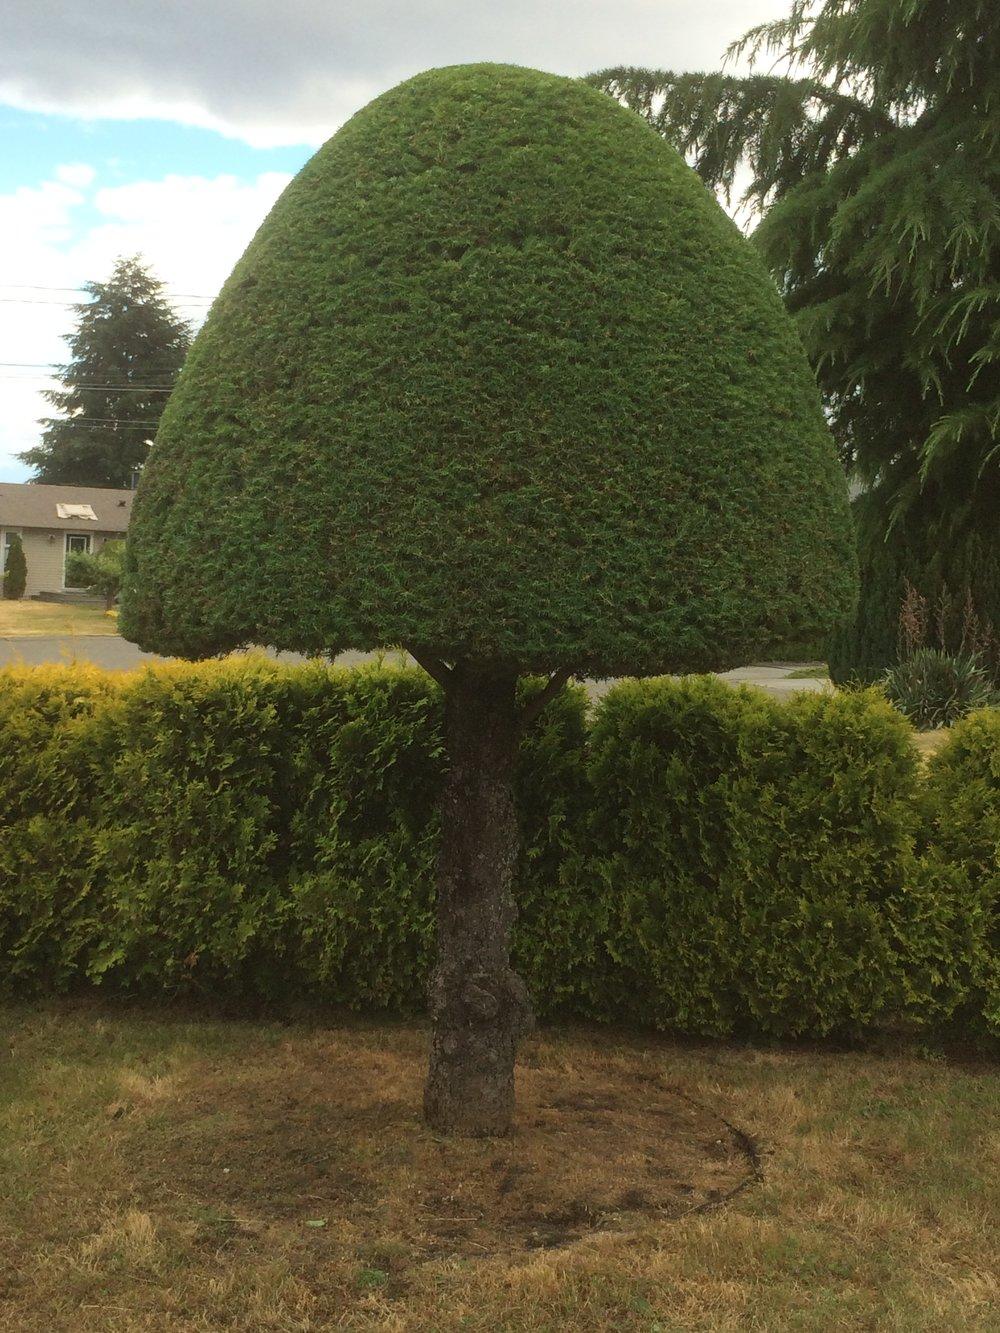 mushroom shaped tree - nanaimo pruning